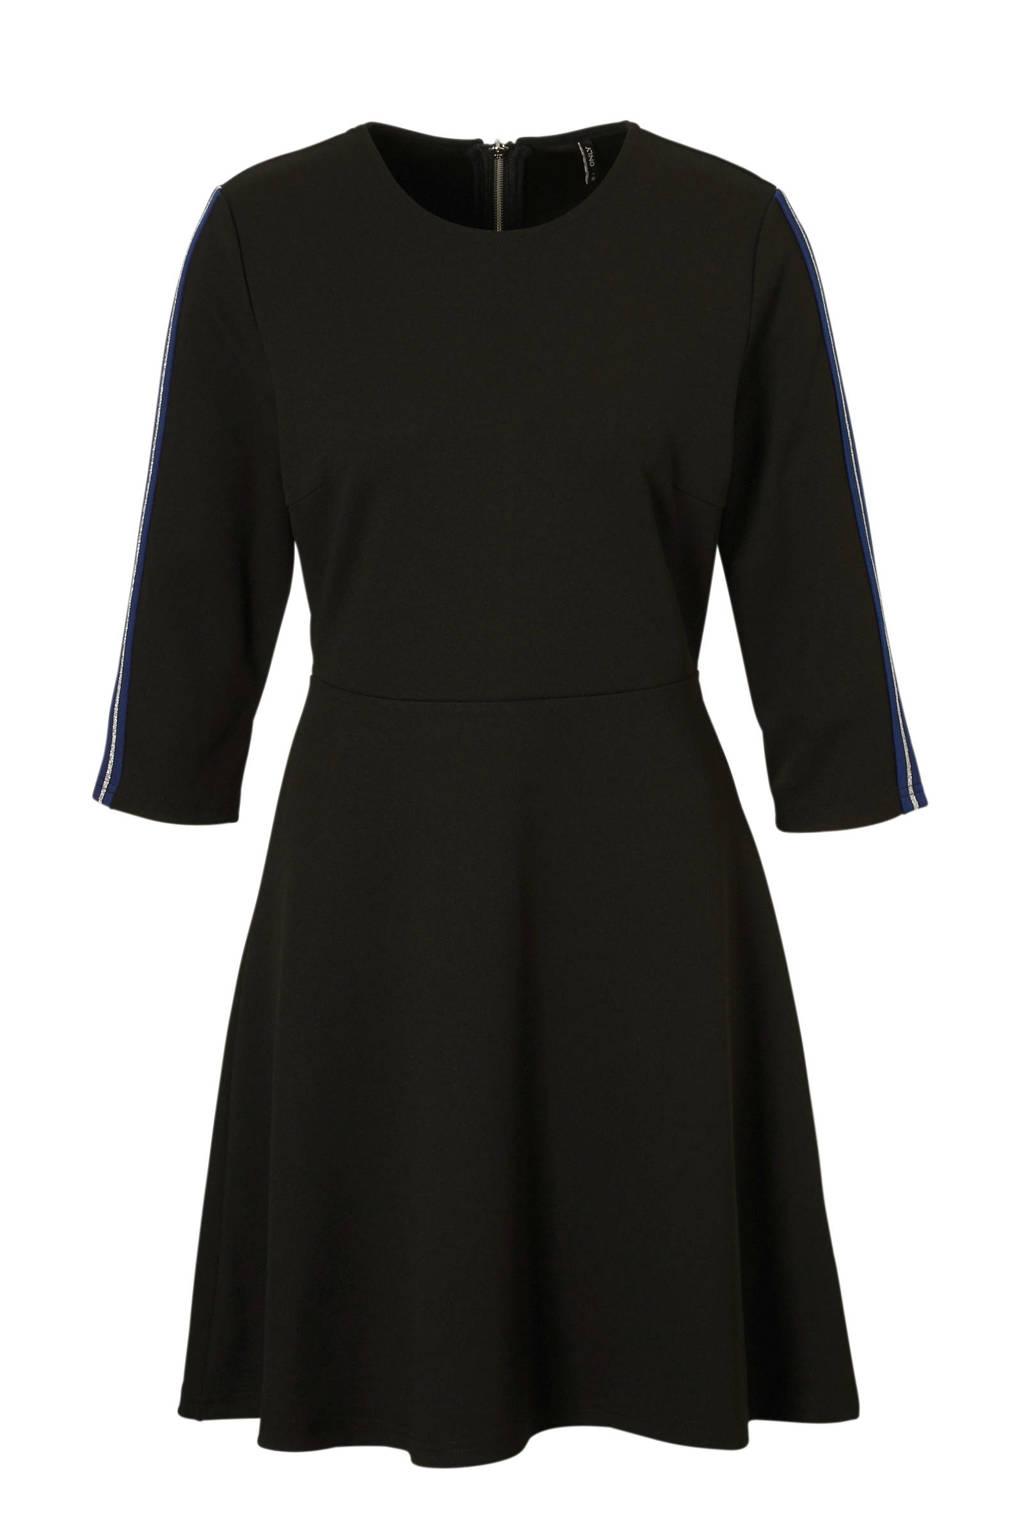 ONLY jurk met streep detail, Zwart/blauw/zilver